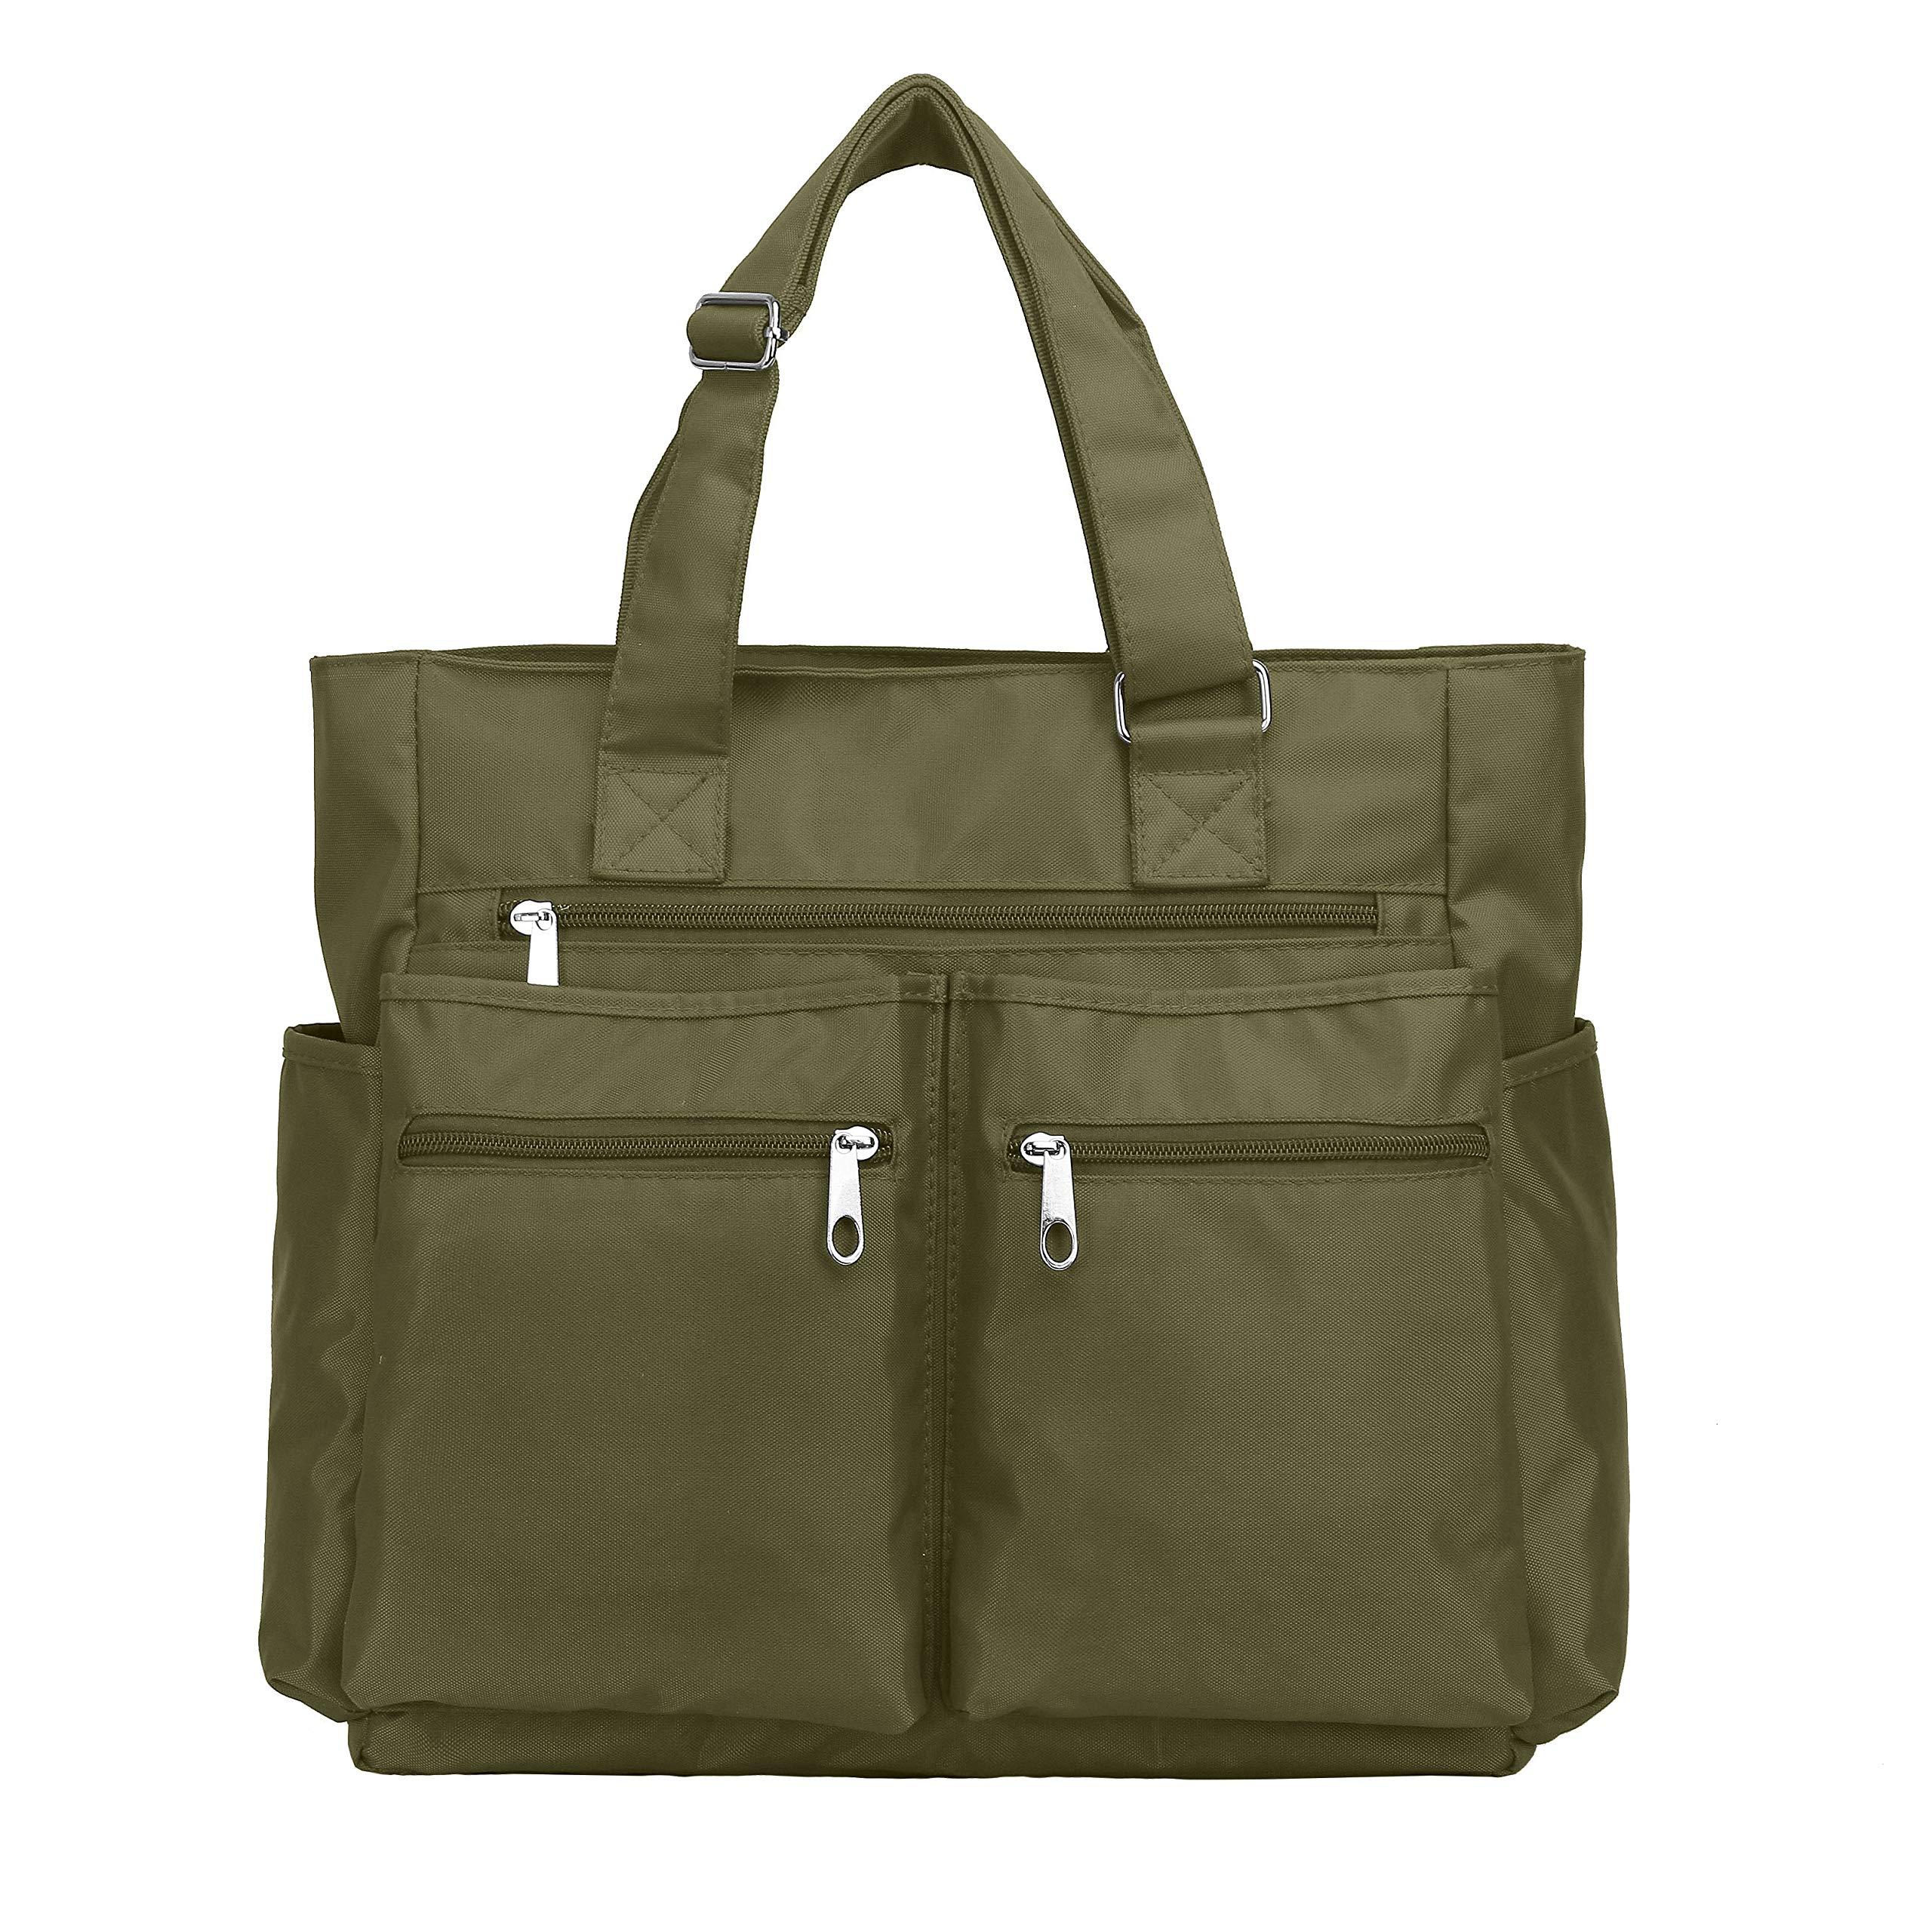 Waterproof Nylon Oxford Multi-pocket Tote Bags Fashion Travel Laptop Briefcase Work Purse for Women & Men (Army Green) by VOLGANIK ROCK